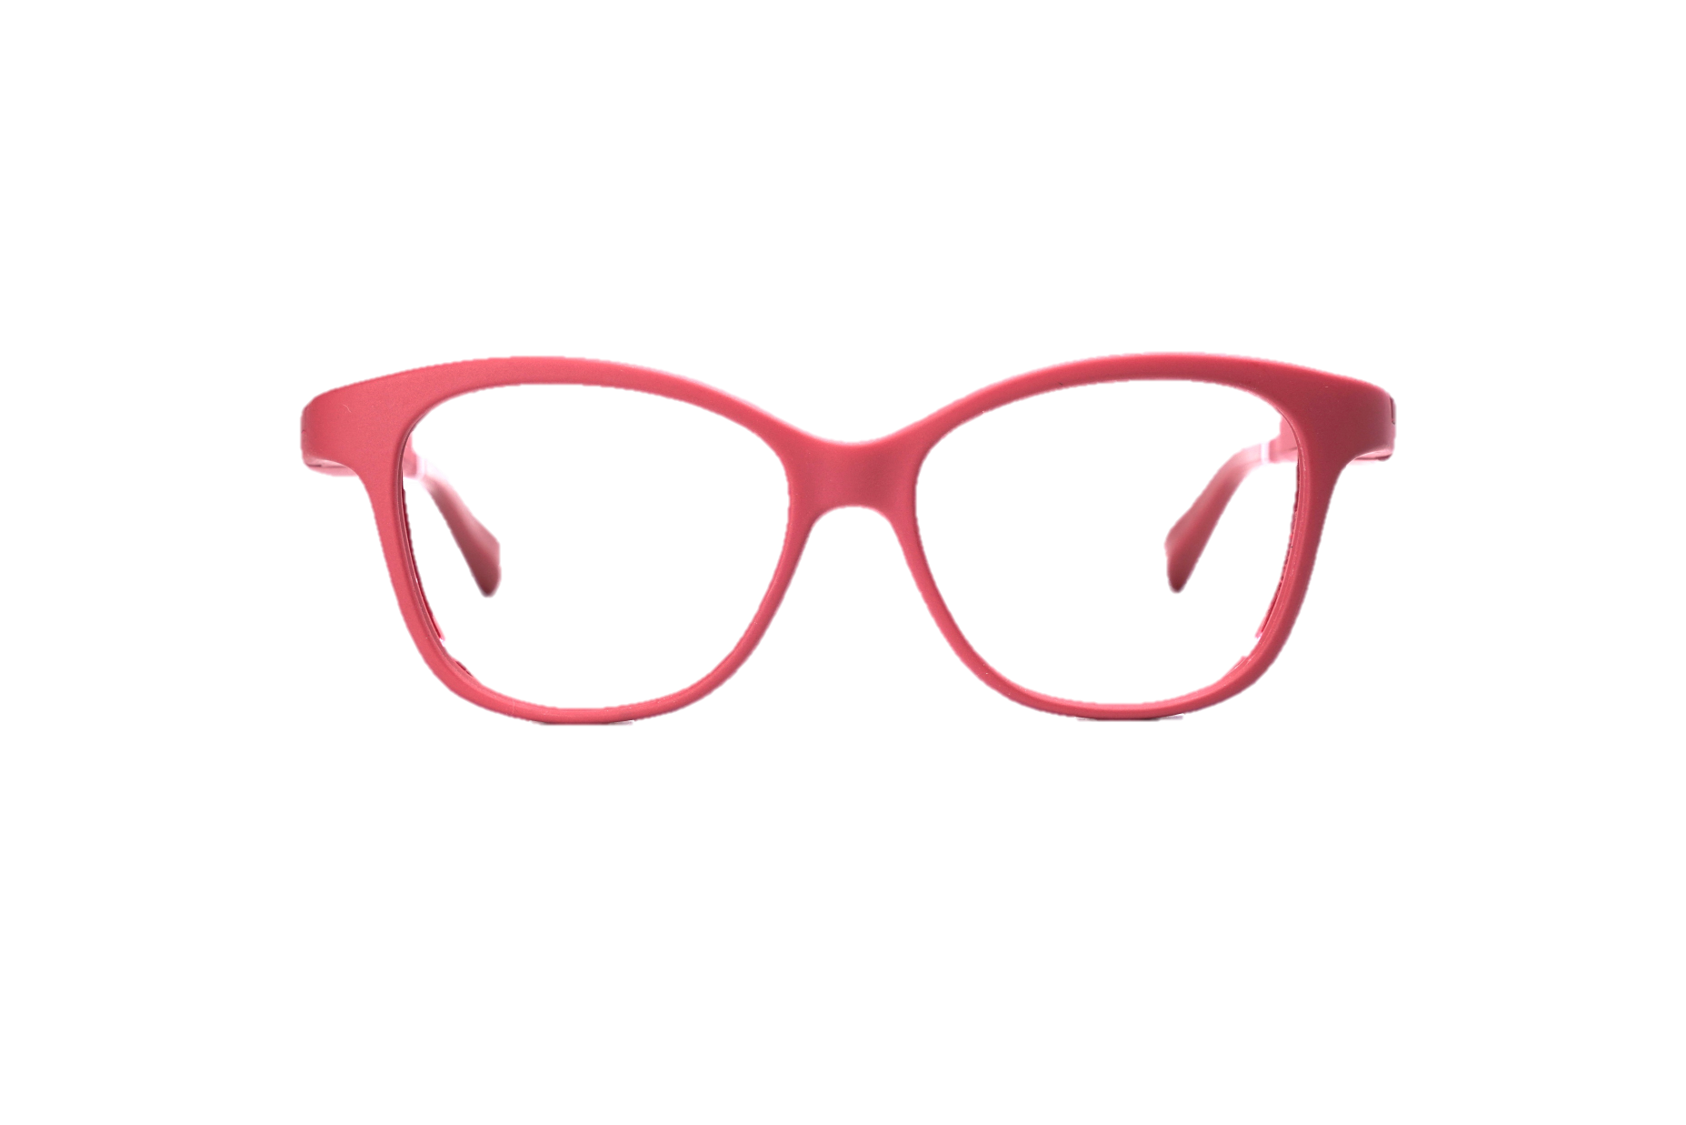 Serenity Eyewear papillon rouge foncé face